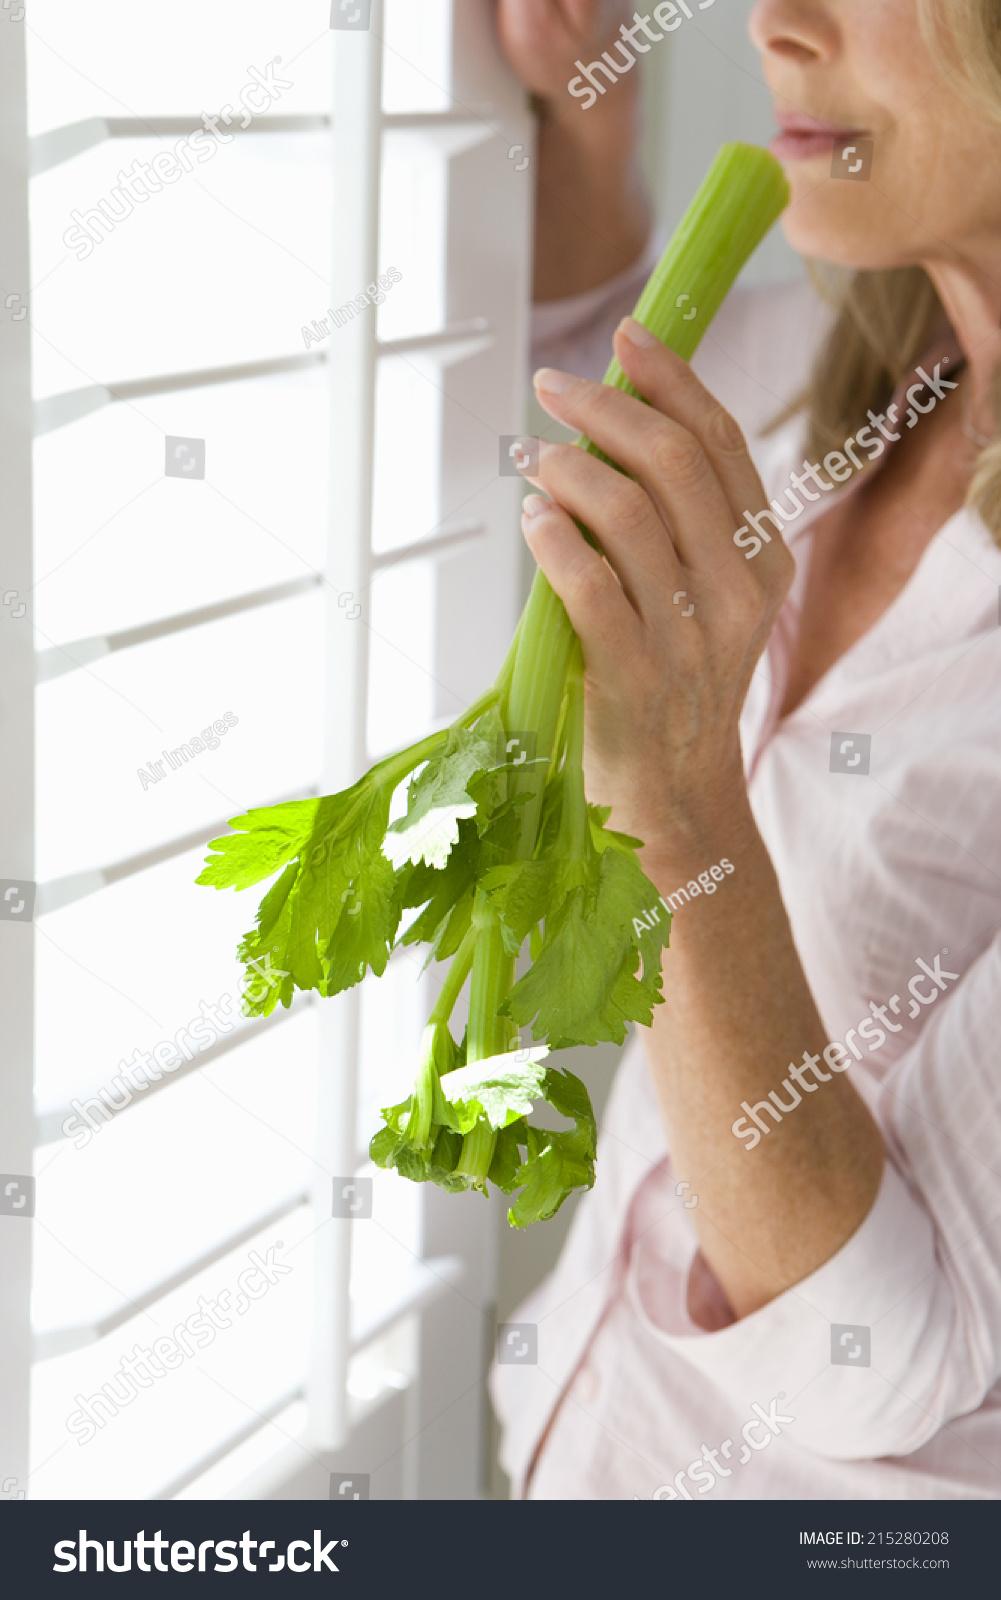 Mature Woman Holding Celery Stick Standing Stock Photo (Edit